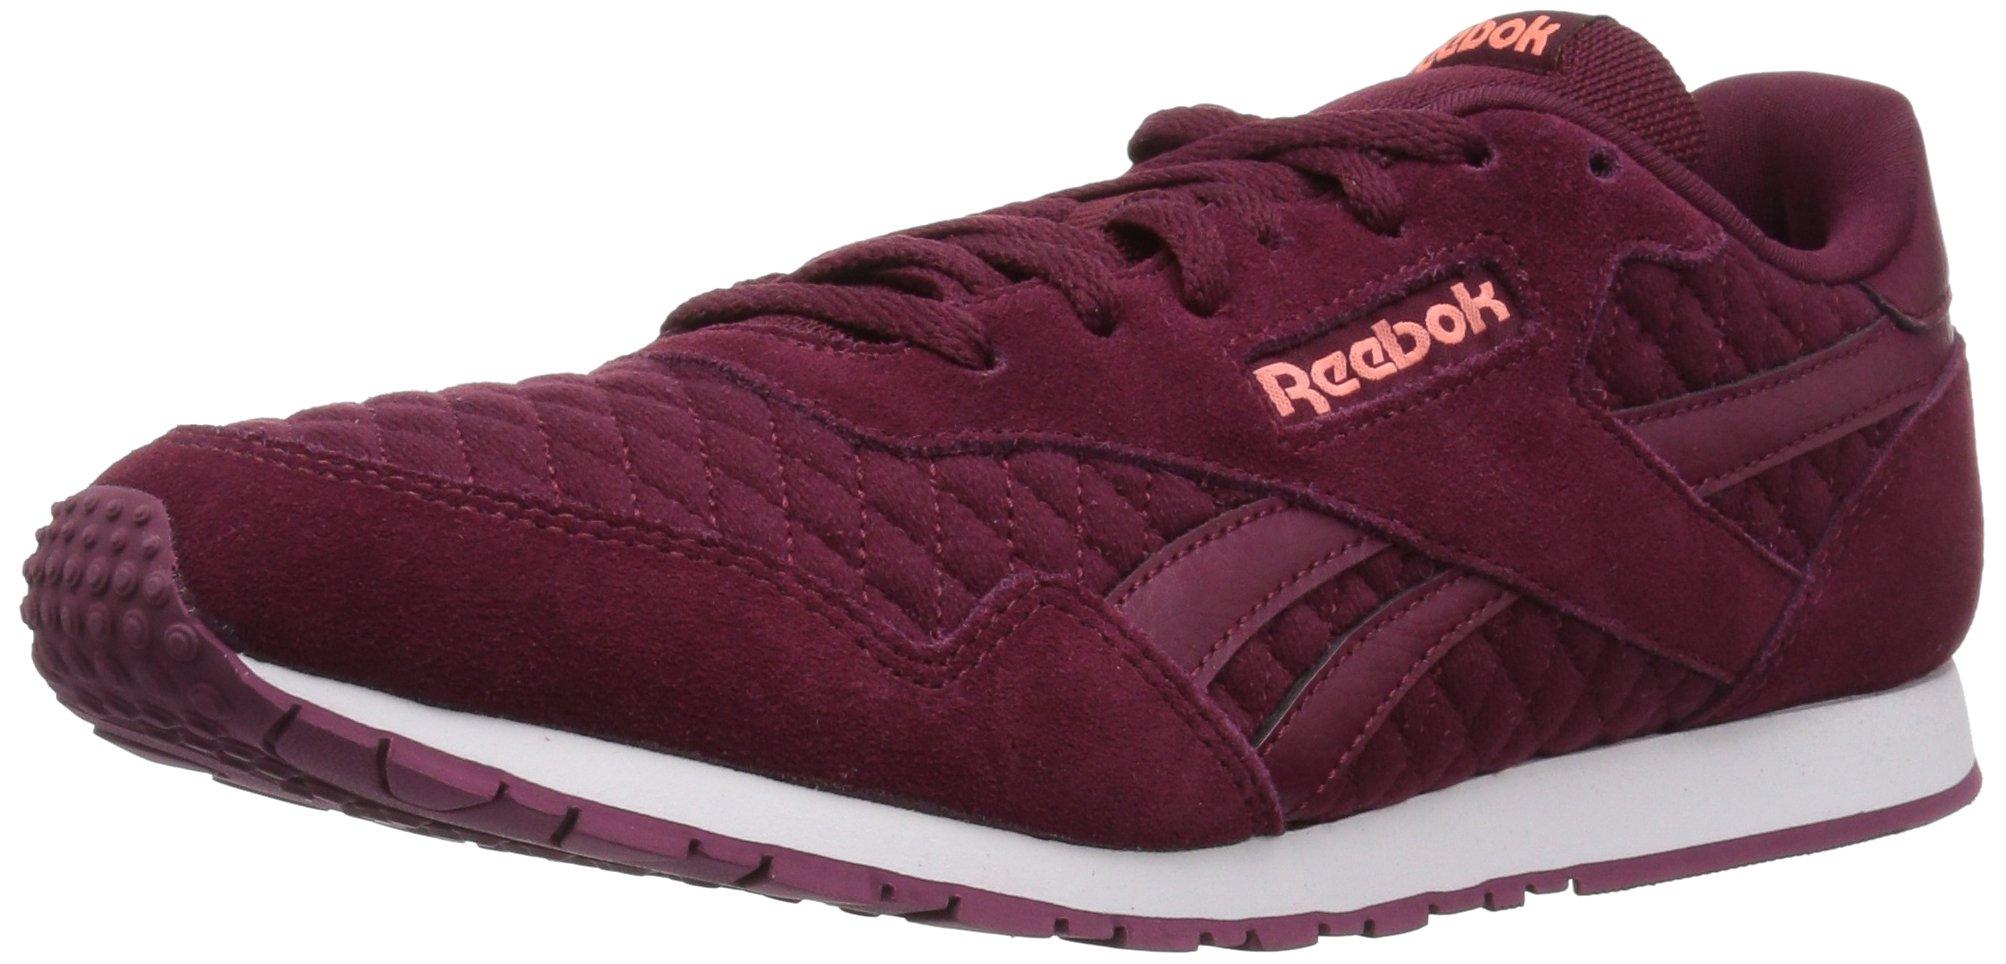 Reebok Women's Royal Ultra Walking Shoe, Rustic Wine/Digital Pink, 10 M US